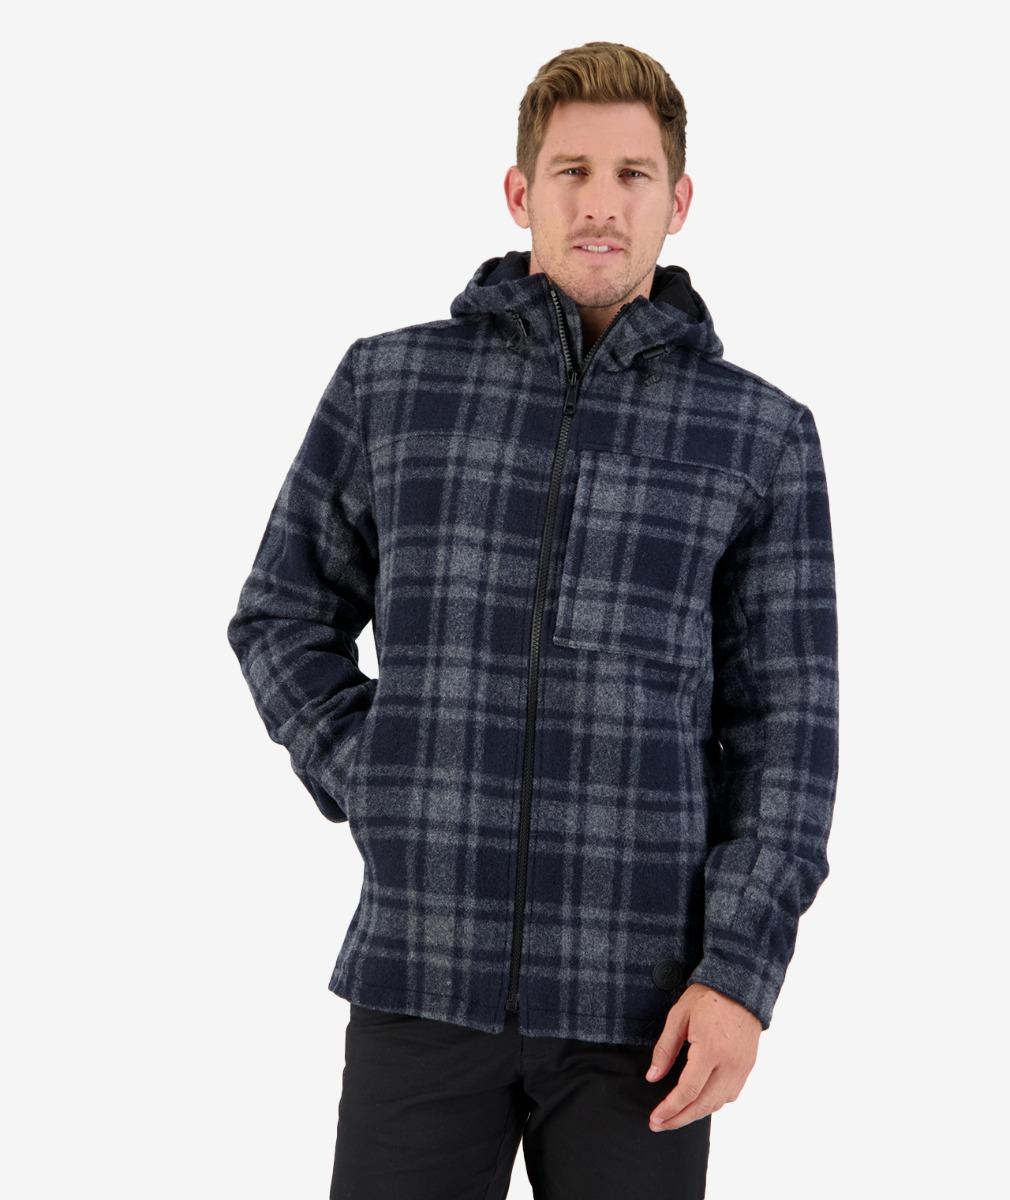 Hudson wool Hoody in Charcoal Grid Check